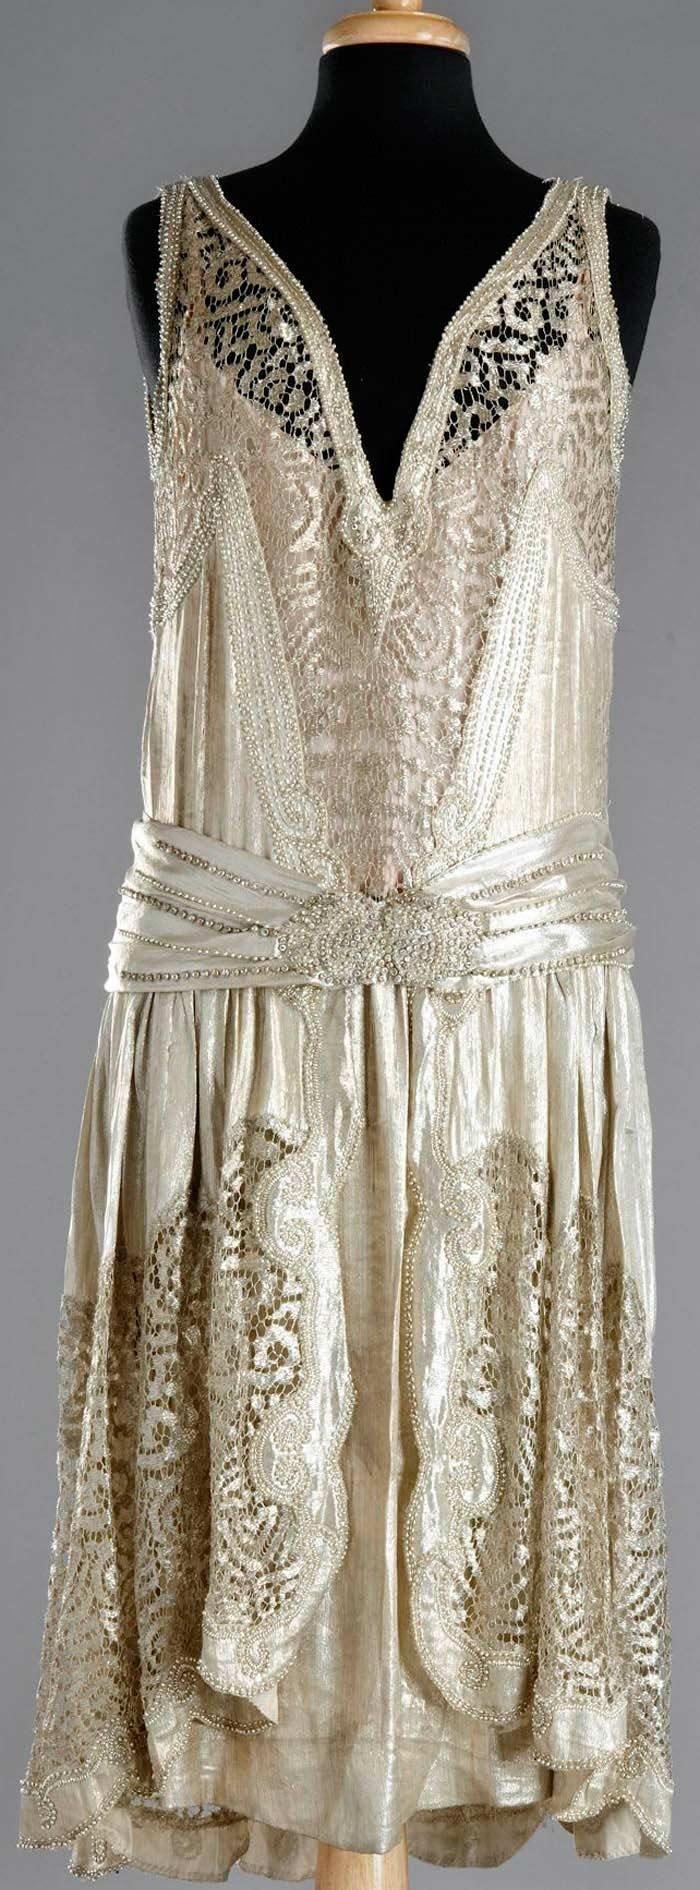 mariage charleston robe 1920 superbe dtail plus - Robe Charleston Mariage